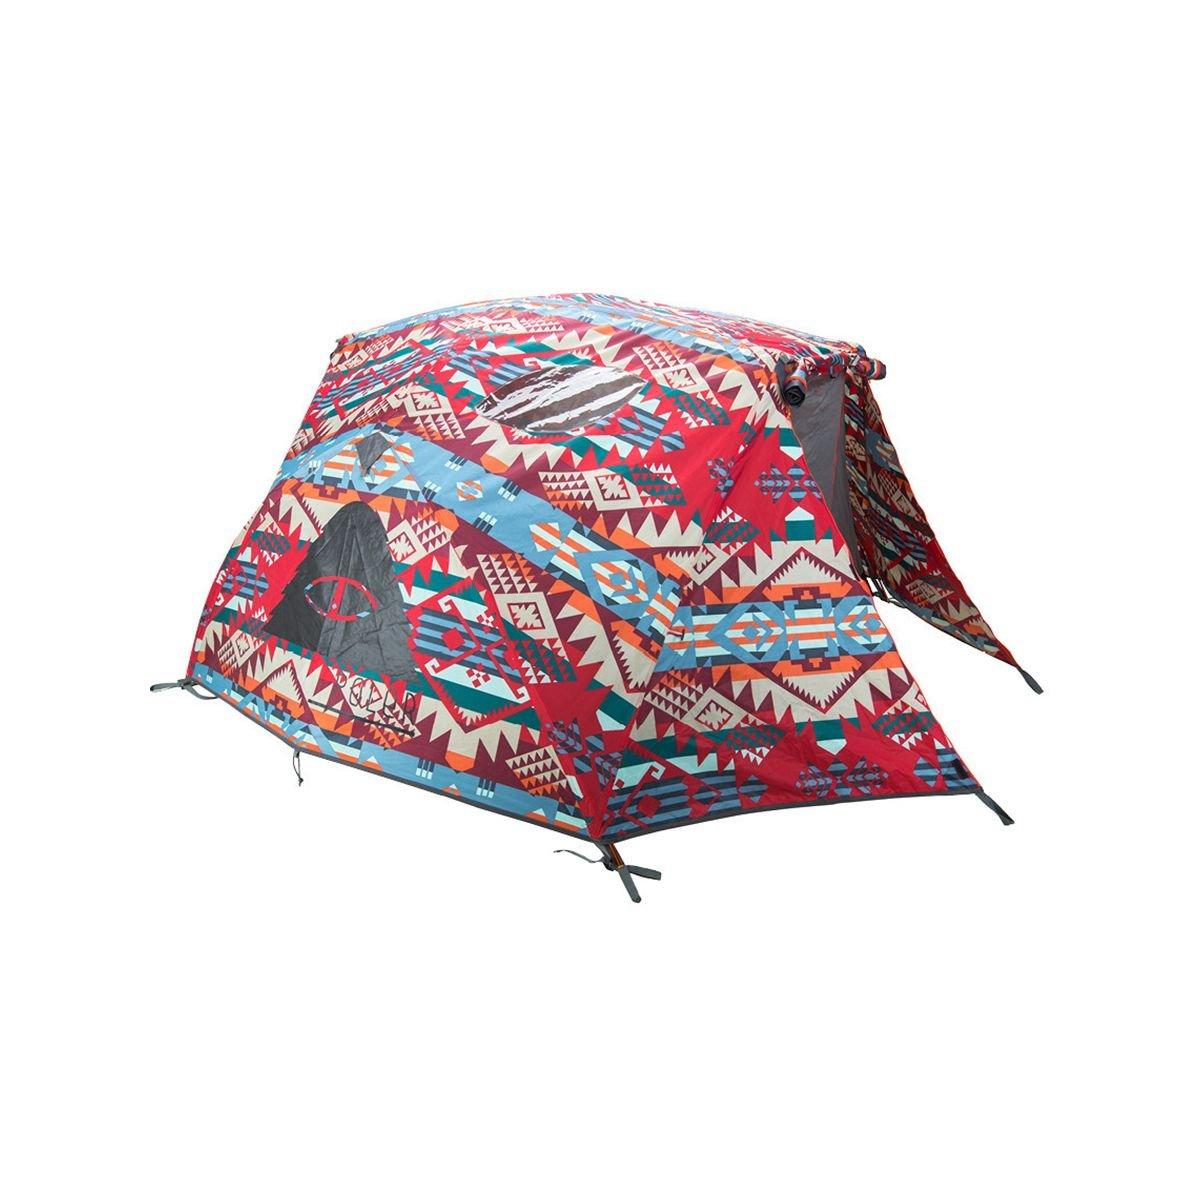 POLER X Pendleton Two Man Tent Journey West 2 2016 Igluzelt